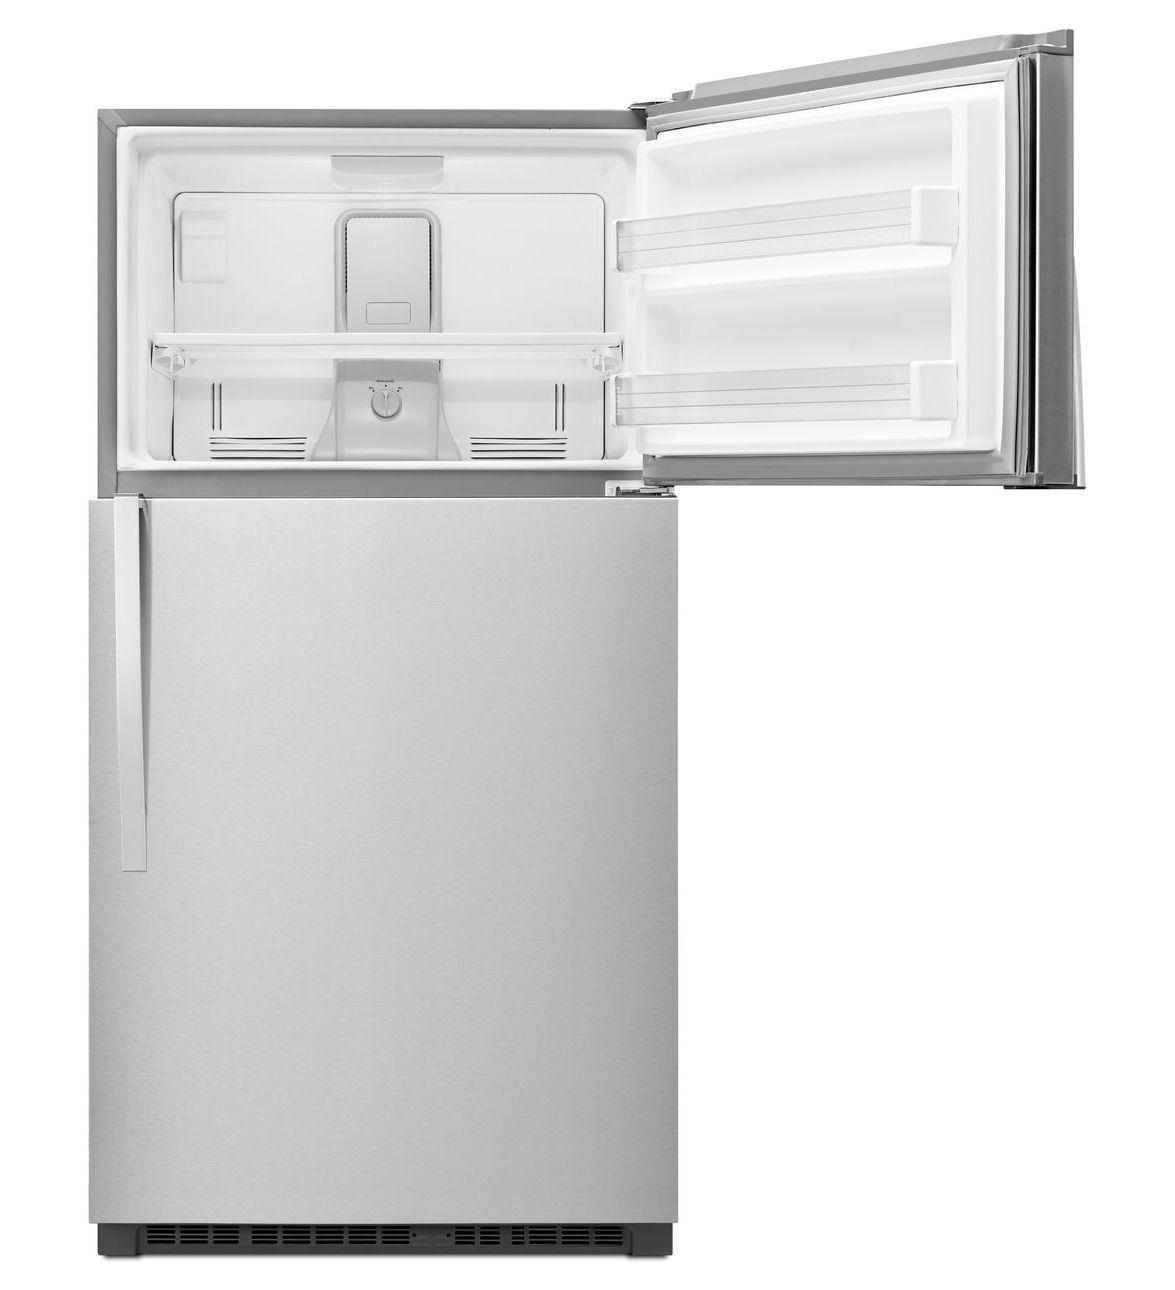 Wrt541szd Whirlpool Wrt541szd Top Freezer Refrigerators